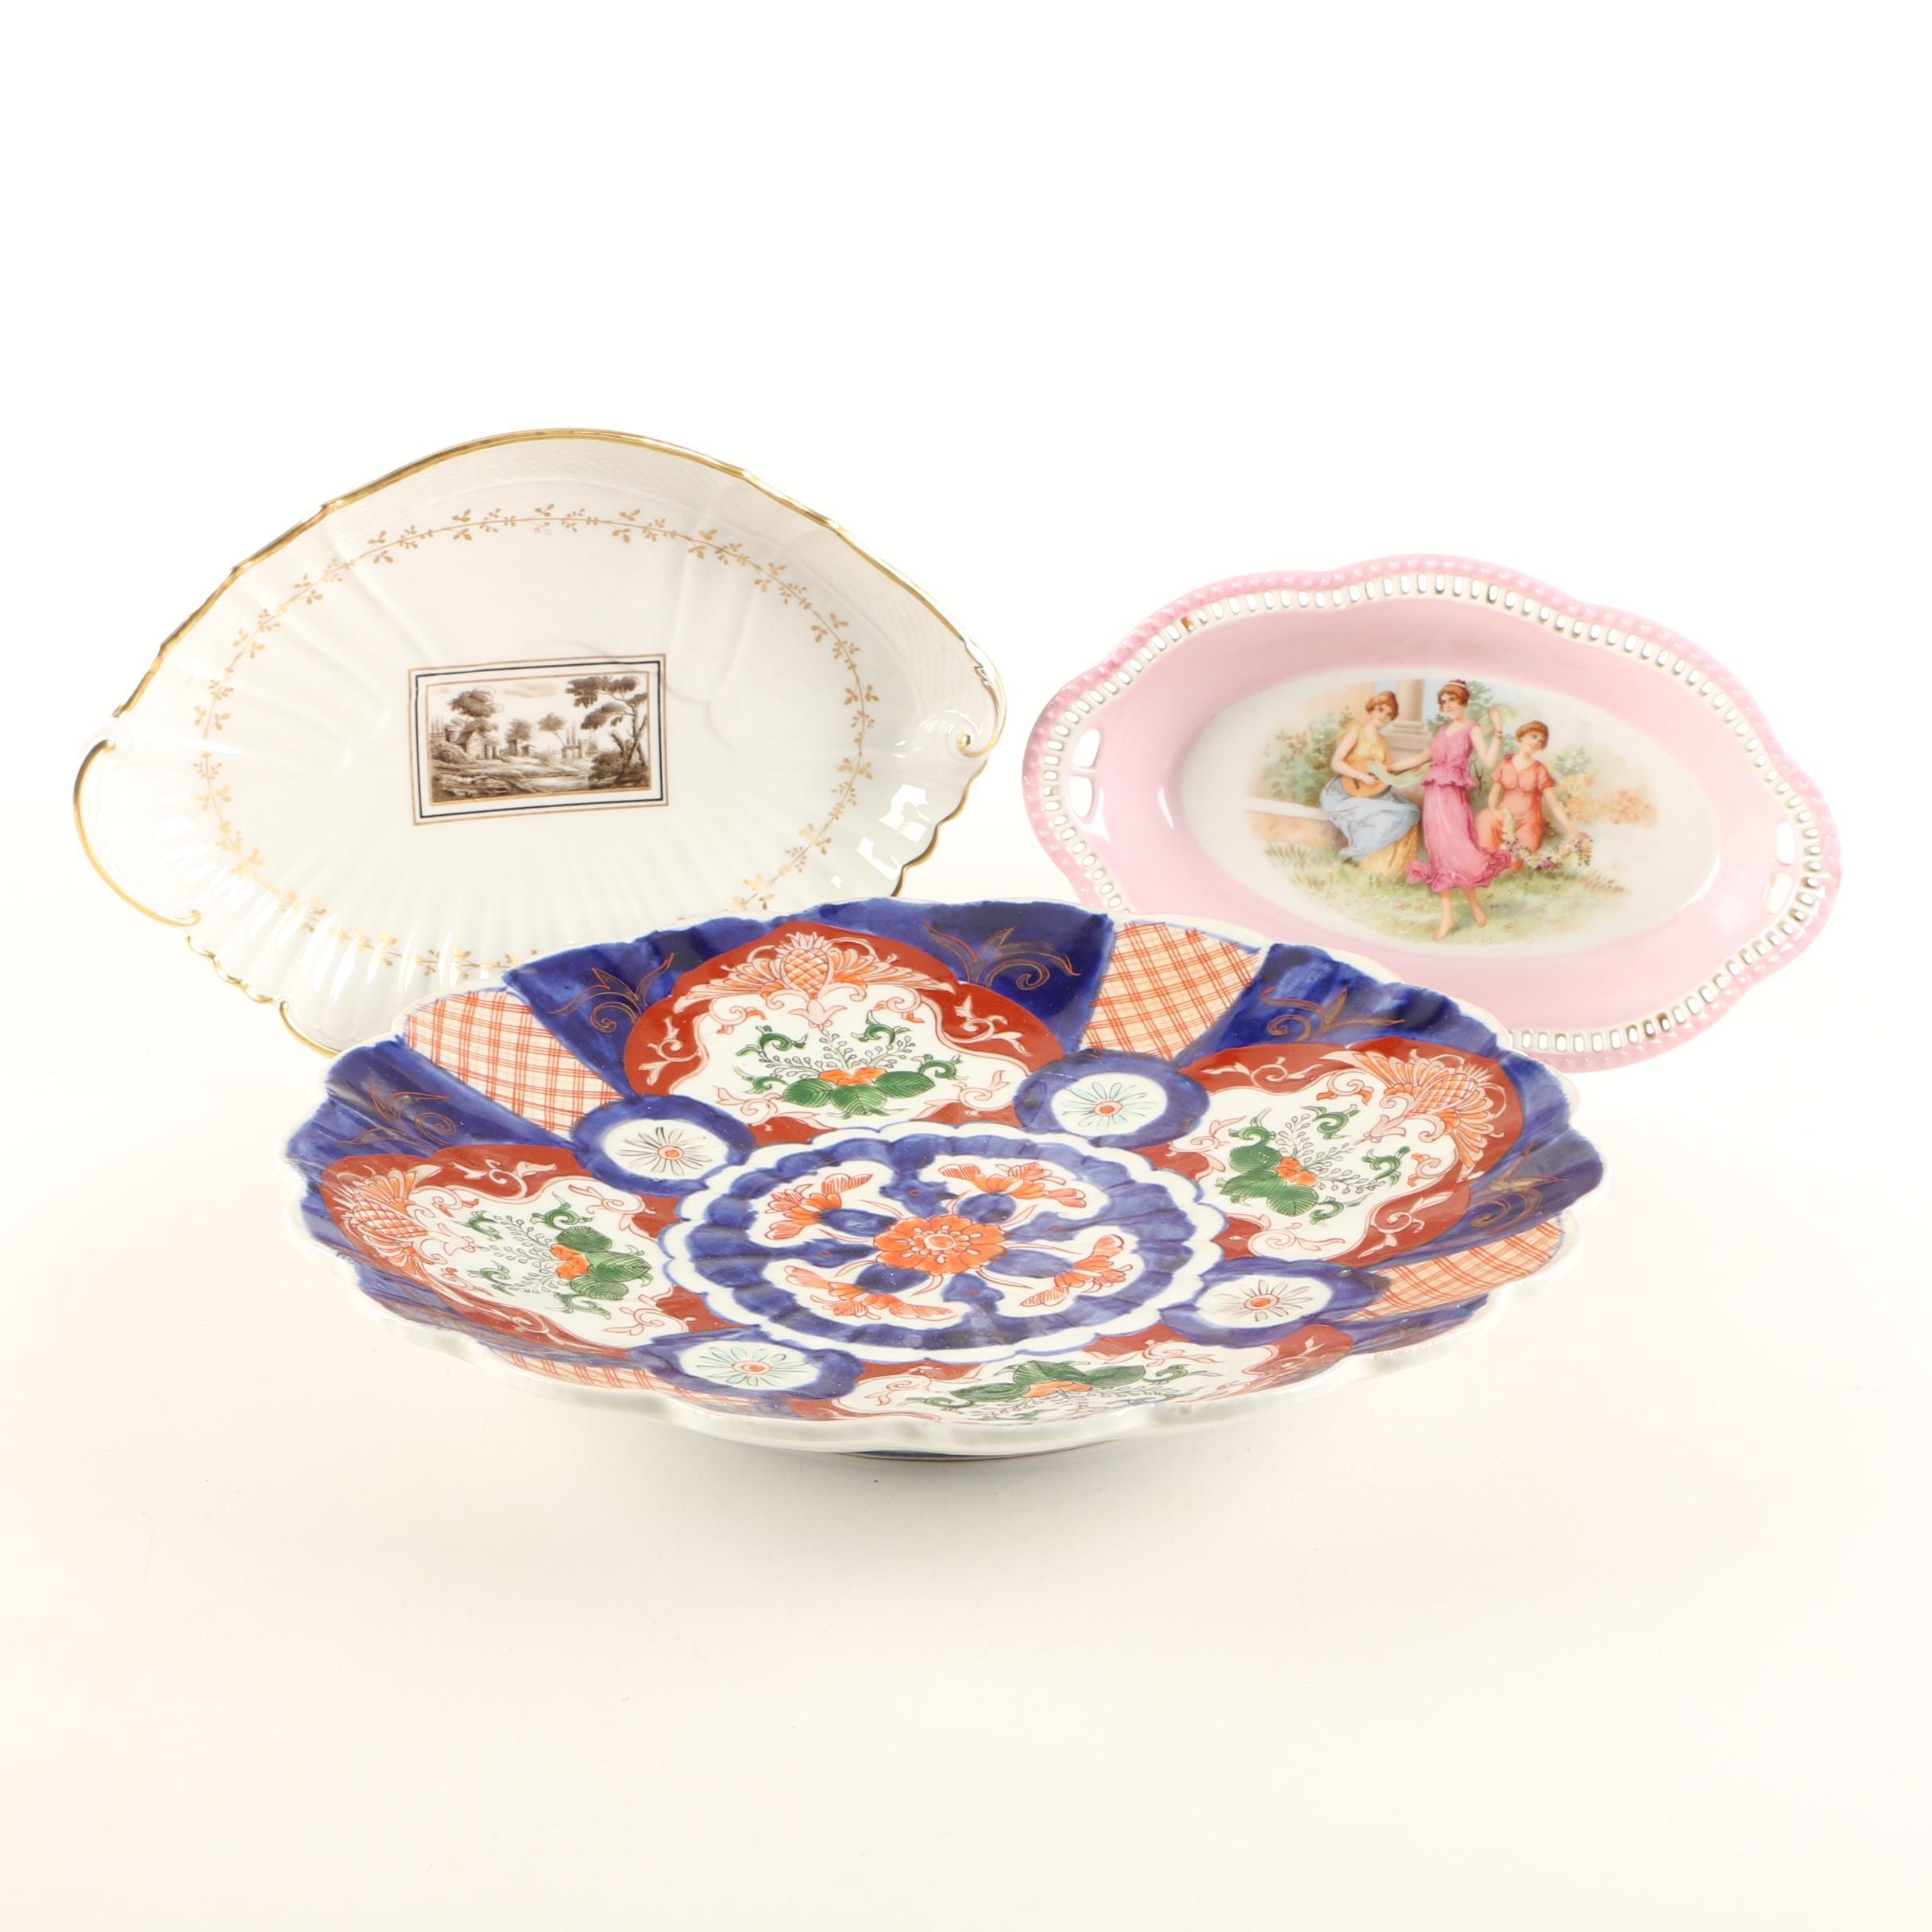 Antique Imari and Richard Ginori Serving Platters